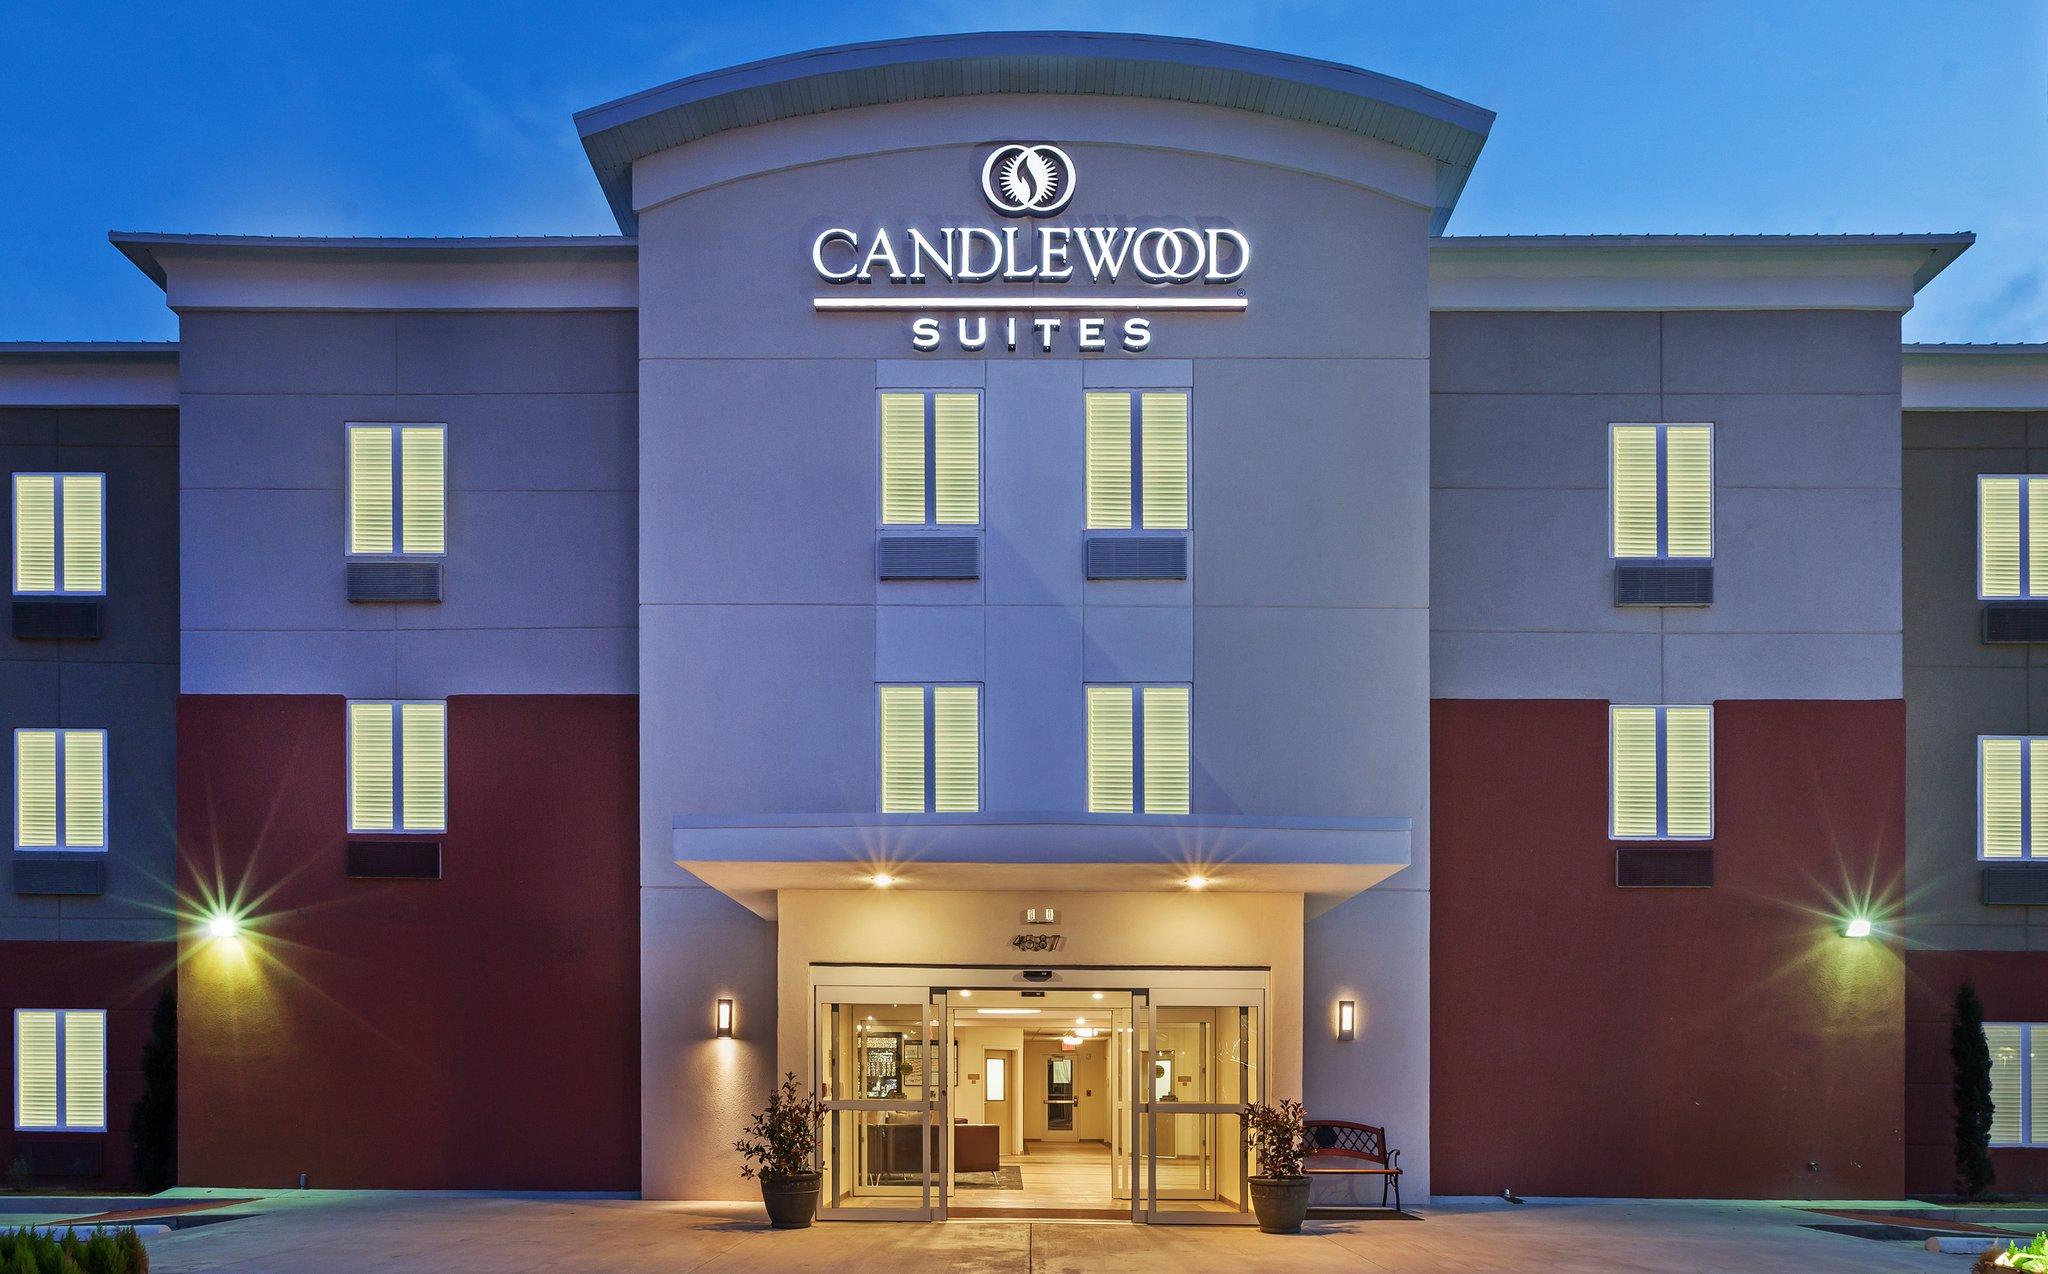 Candlewood Suites SAN ANGELO TX